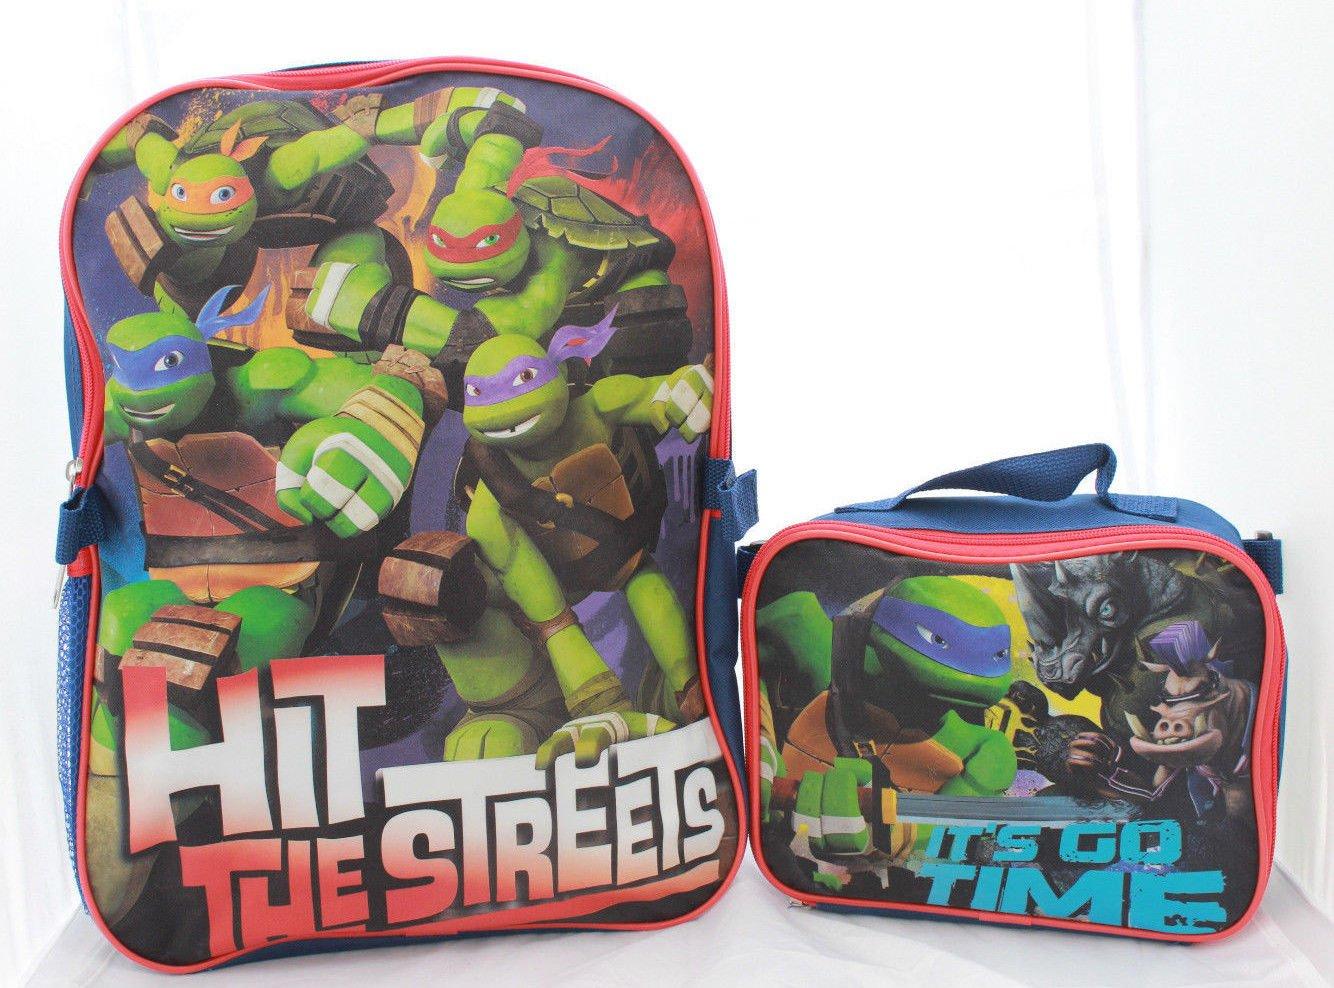 Ninja Turtles Backpack School BookBag with Lunch Box Set TMNT